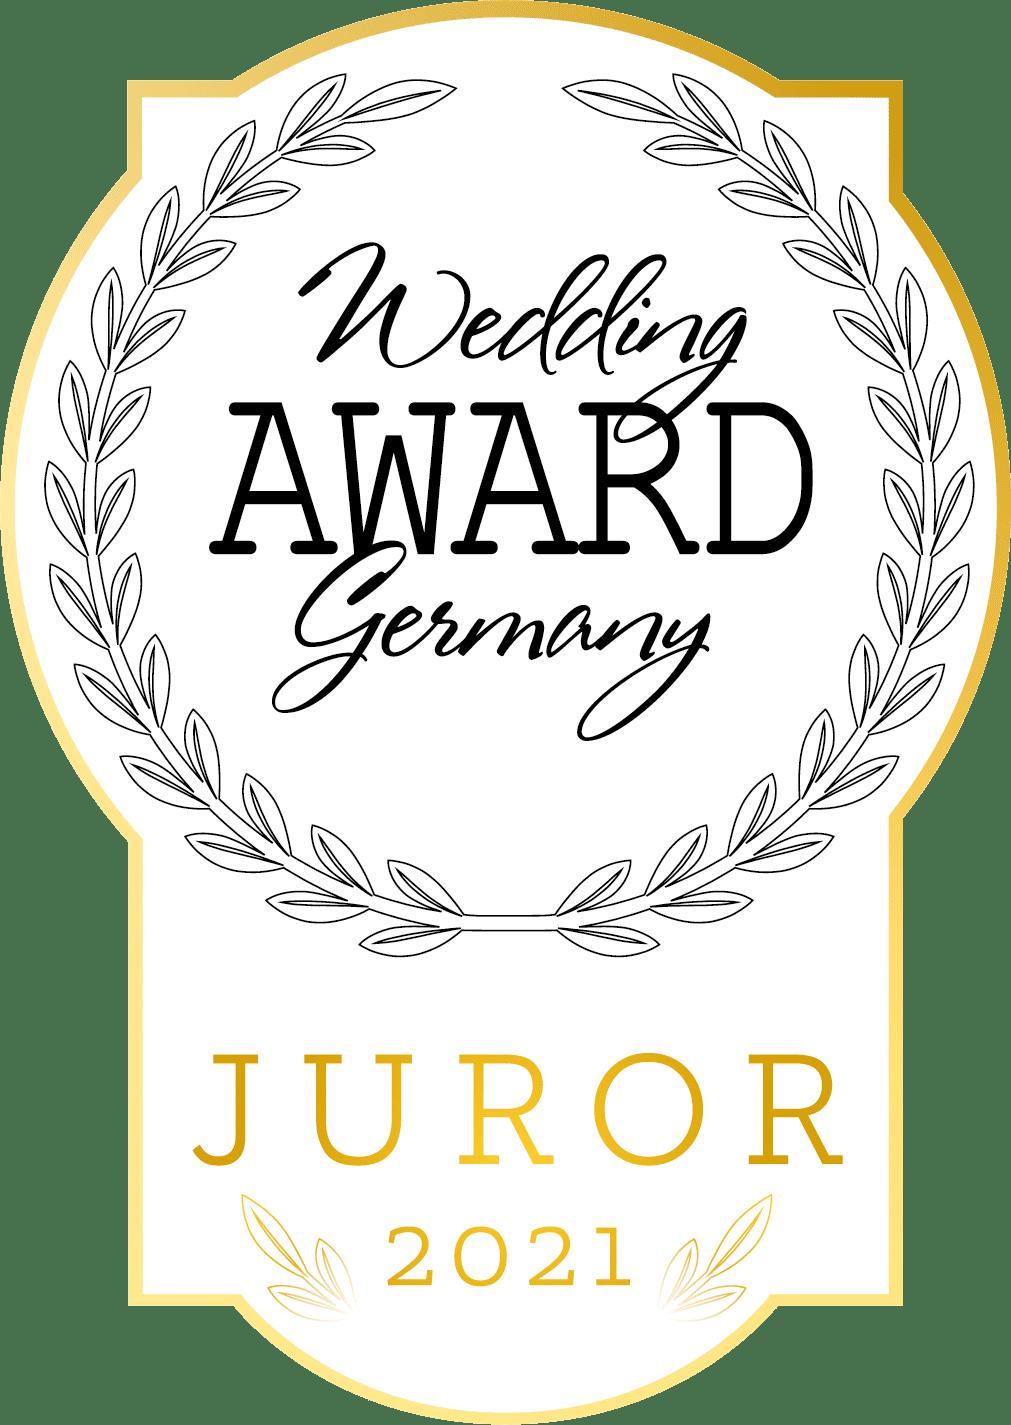 https://grant-hochzeit.de/wp-content/uploads/2020/09/Jury-Badge.png